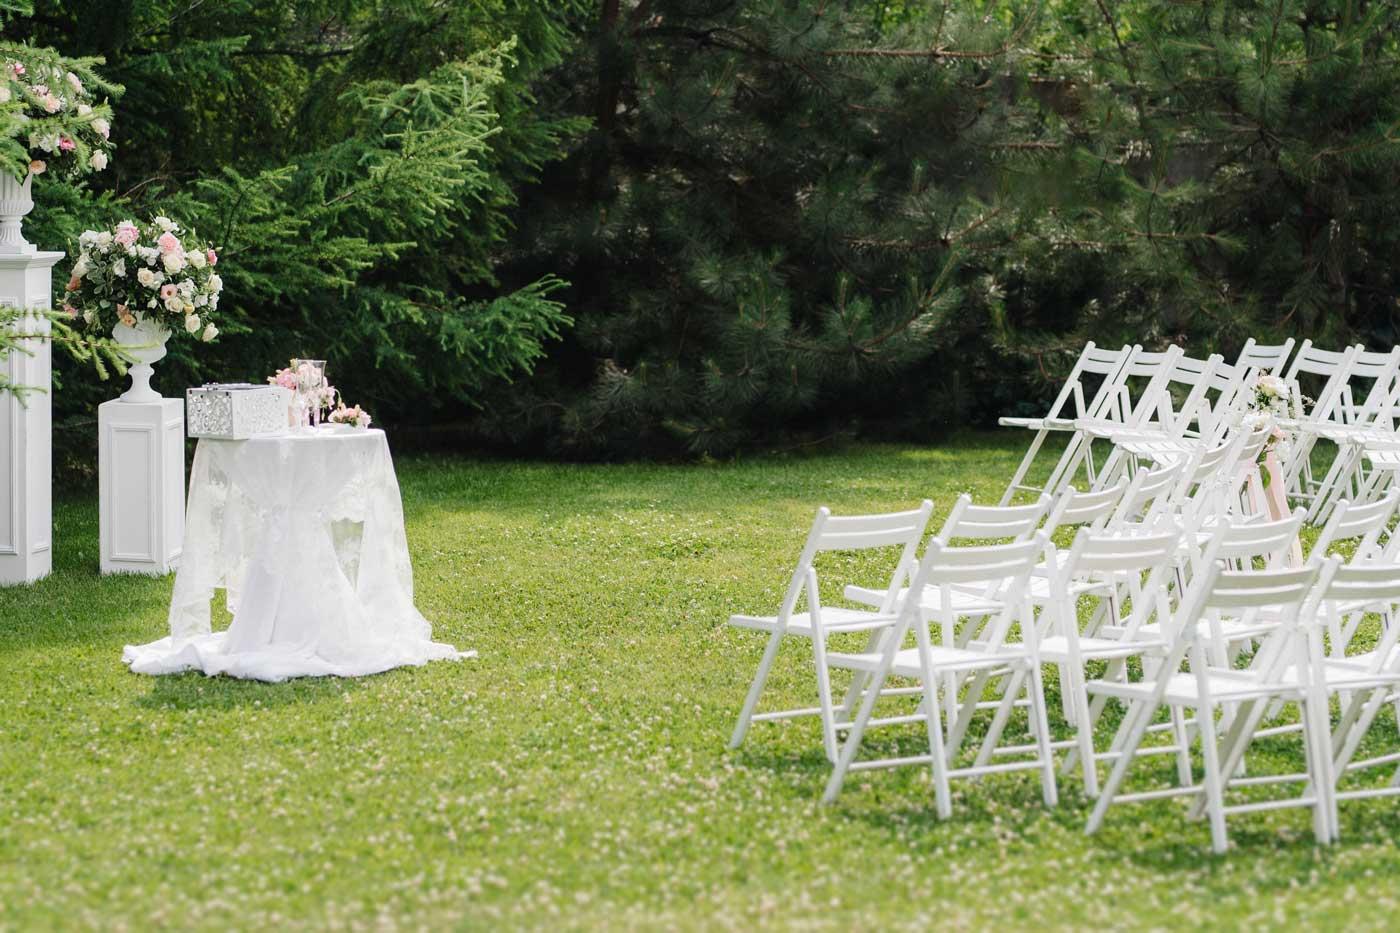 wedding-ceremony-area-S4DH99R